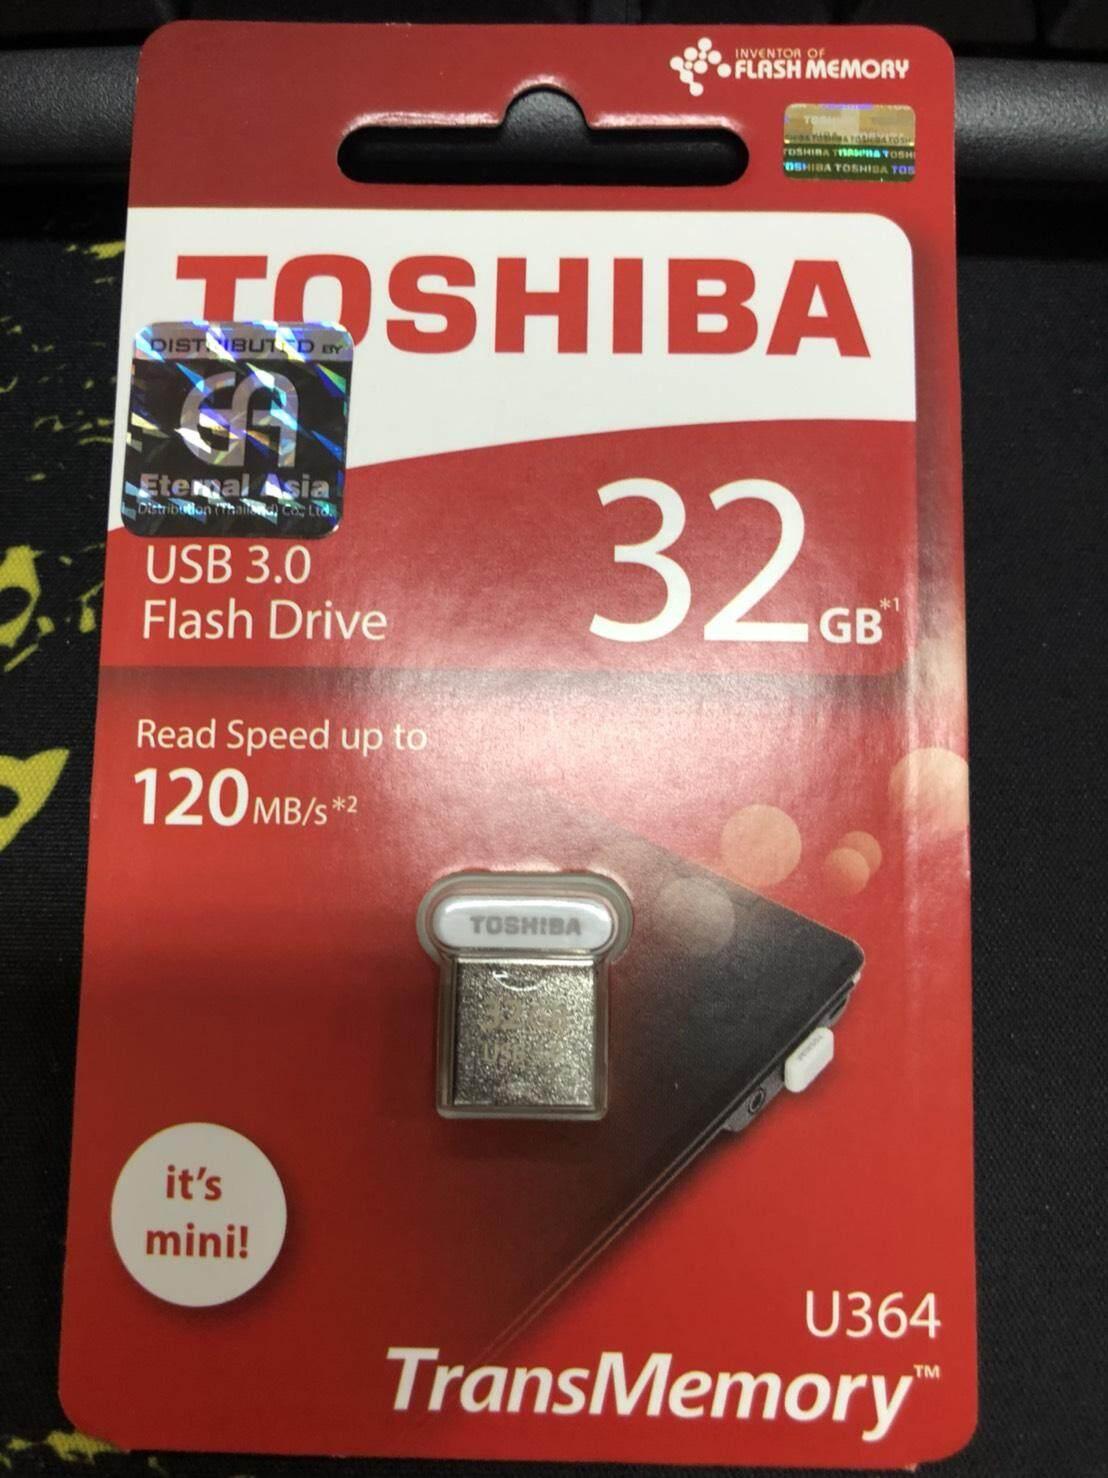 Sell Toshiba 52xv648 32lv67 Cheapest Best Quality Th Store Lcd Led Laptop Satellite C600 C640 L600 L640 L645 L740 L745 Thb 419